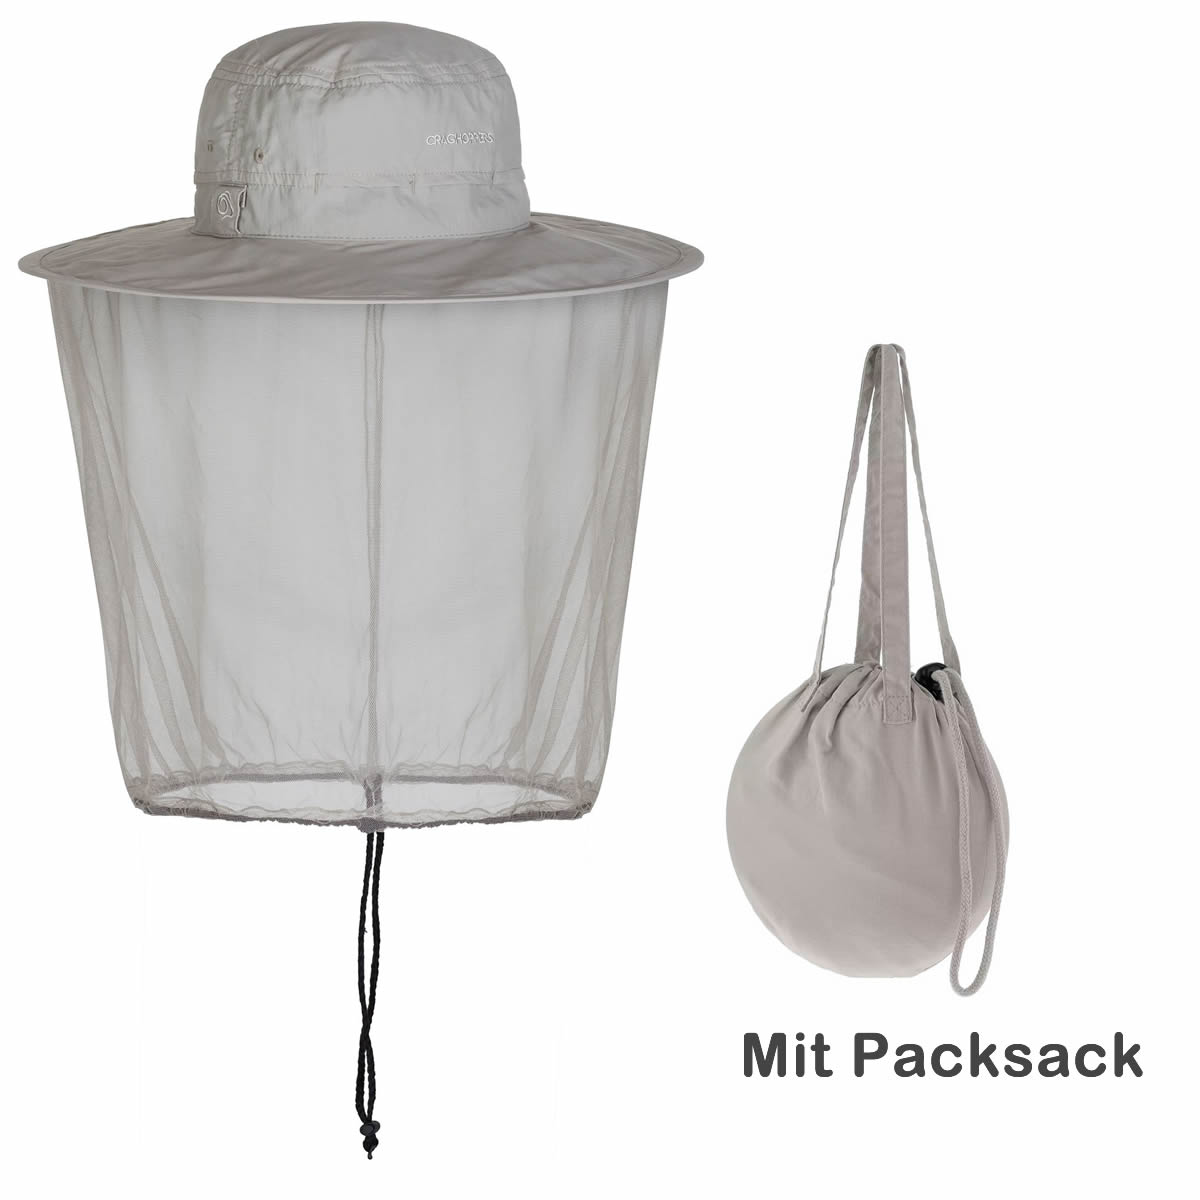 Craghoppers Packaway Mückenschutz Insektenschutz Hut